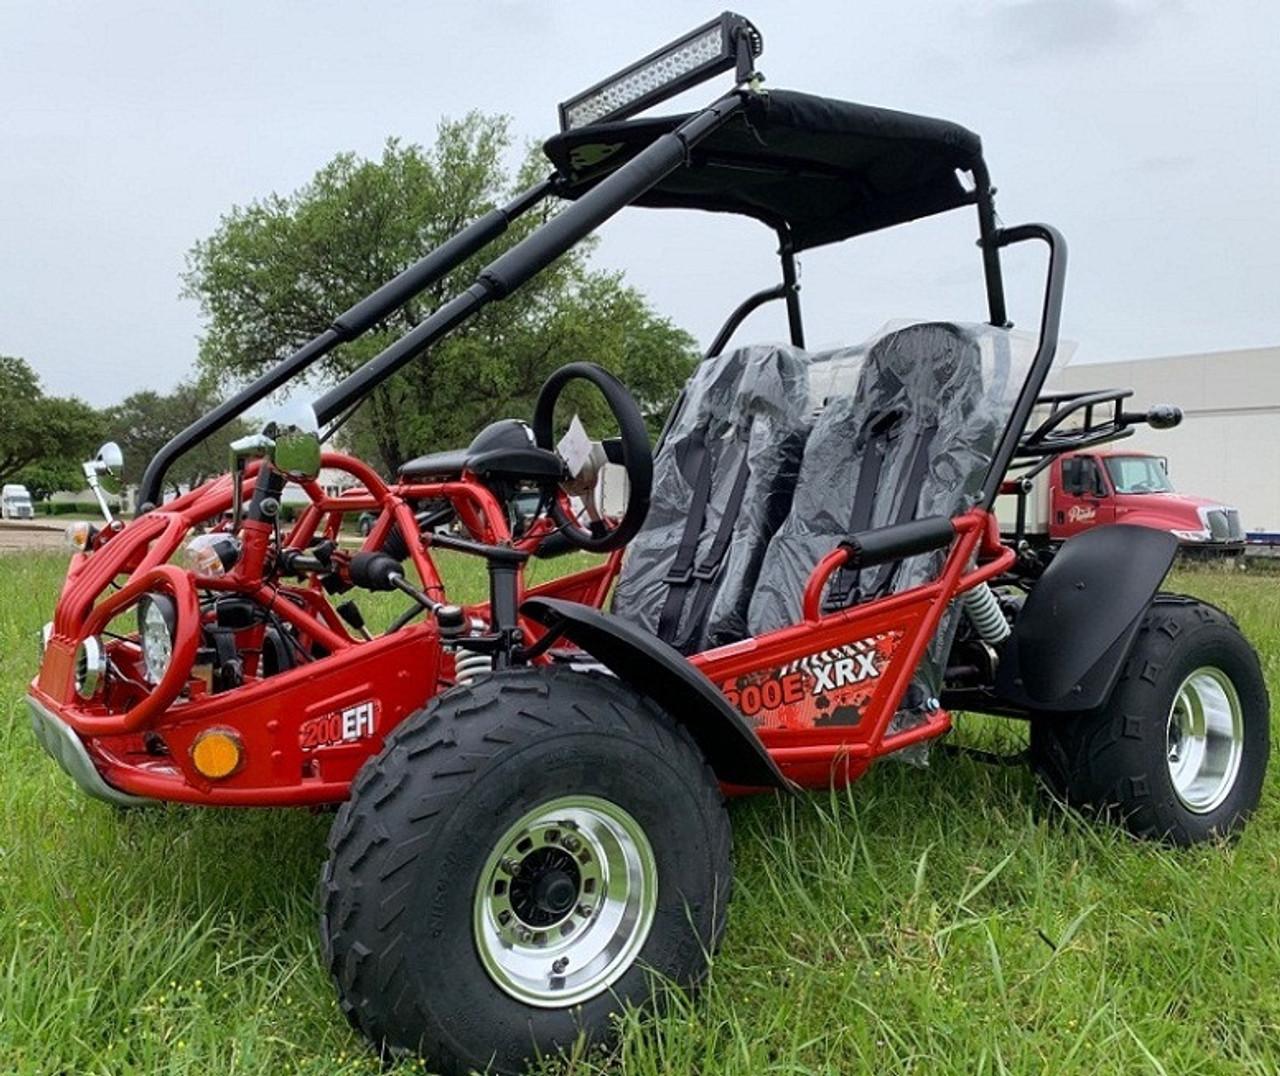 New TrailMaster 200E XRX (EFI) Go Kart, 168.9cc Fully Automatic, Electric Start, Kill Switch